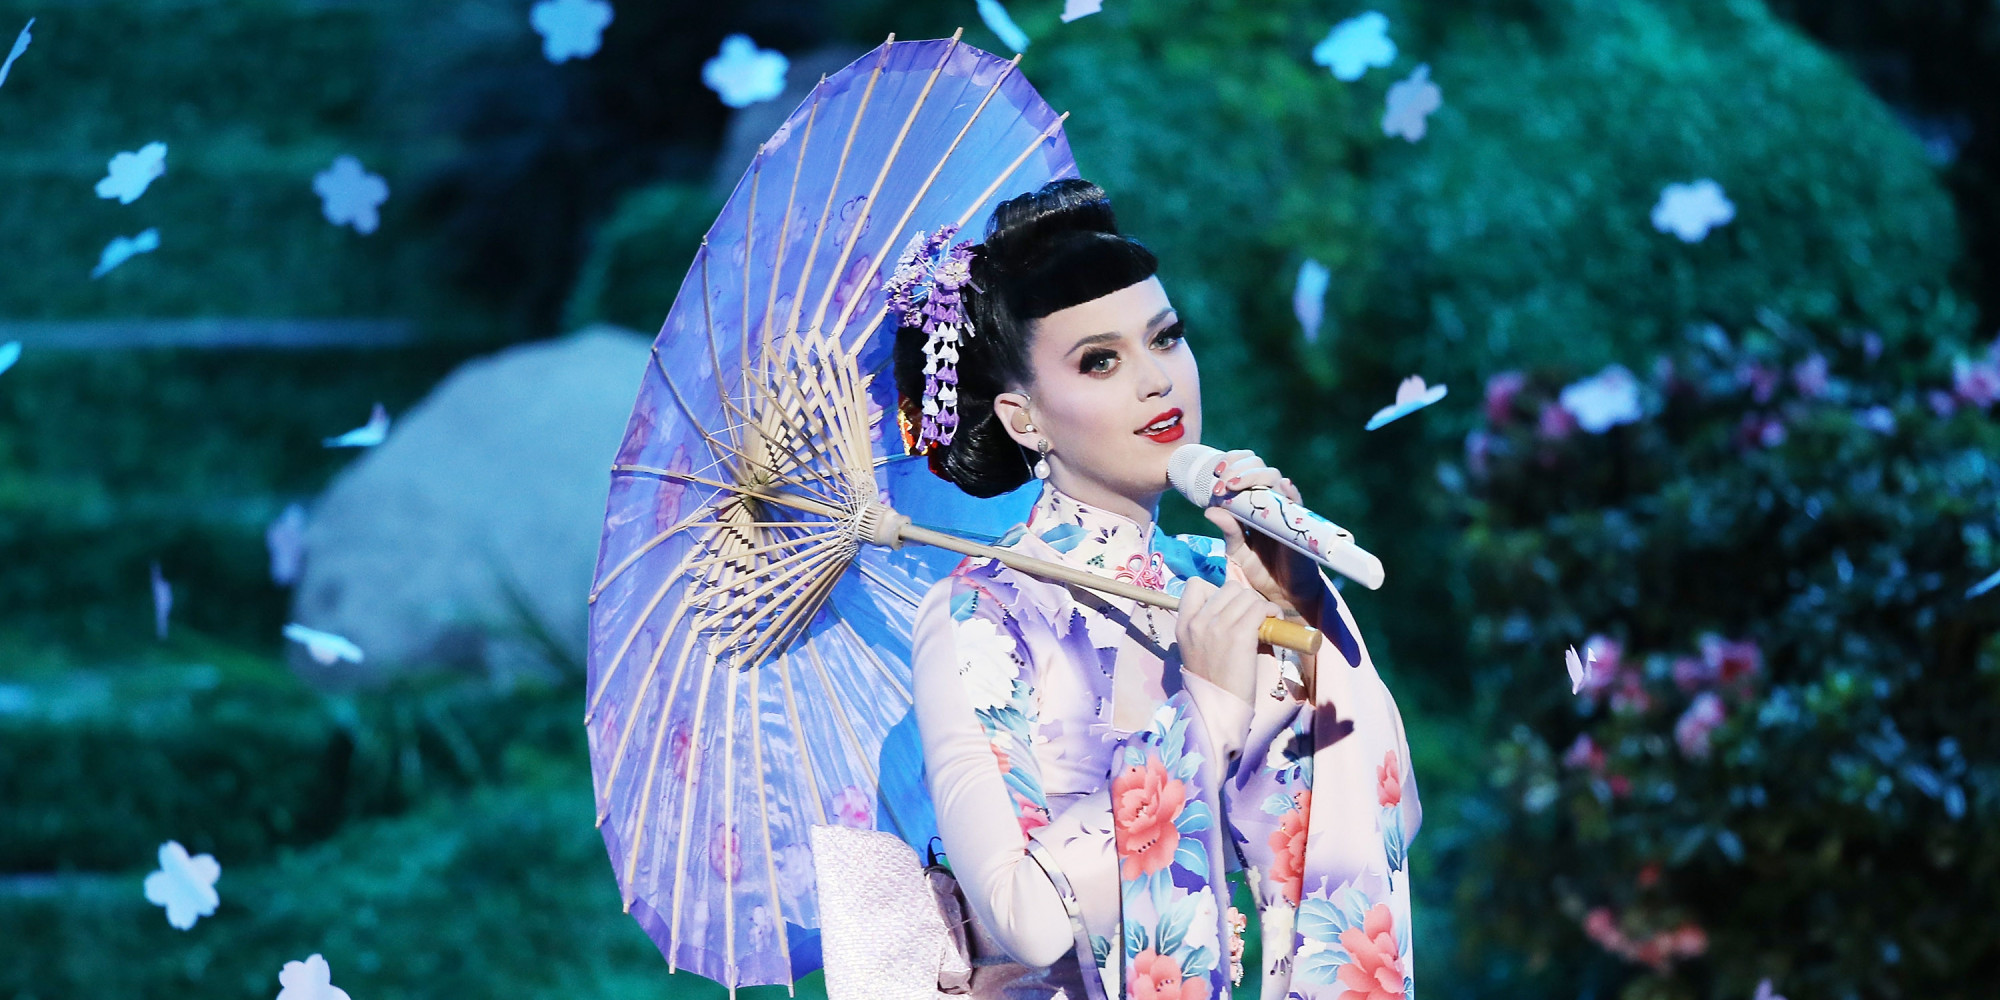 Katy Perry performing as a geisha at the 2013 American Music Awards